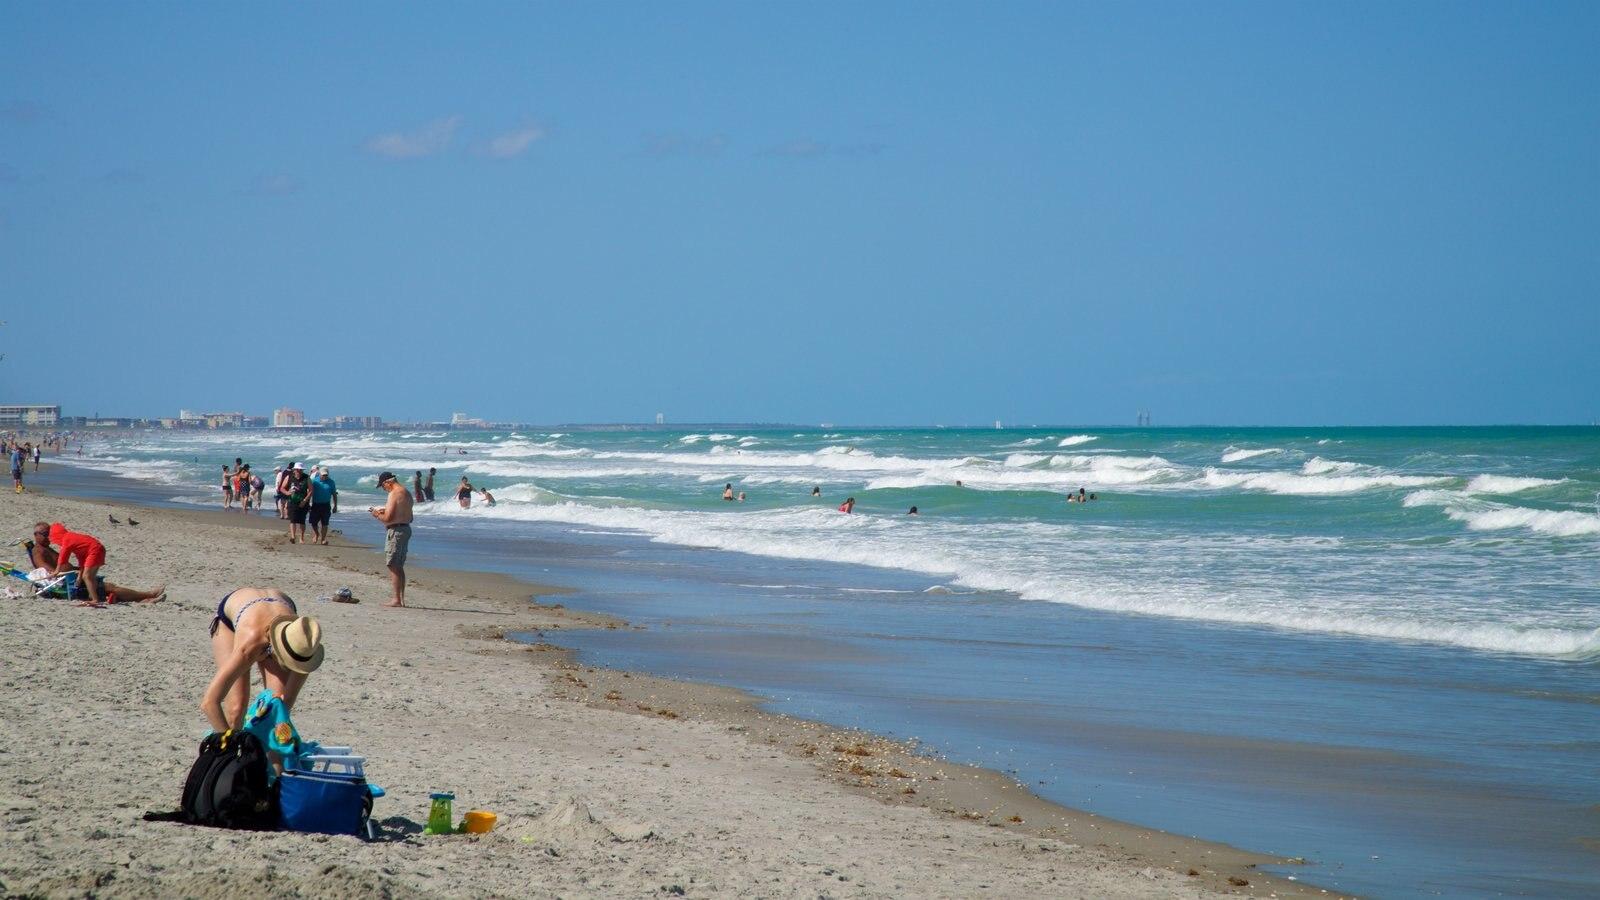 Cocoa Beach showing a beach and general coastal views as well as an individual femail